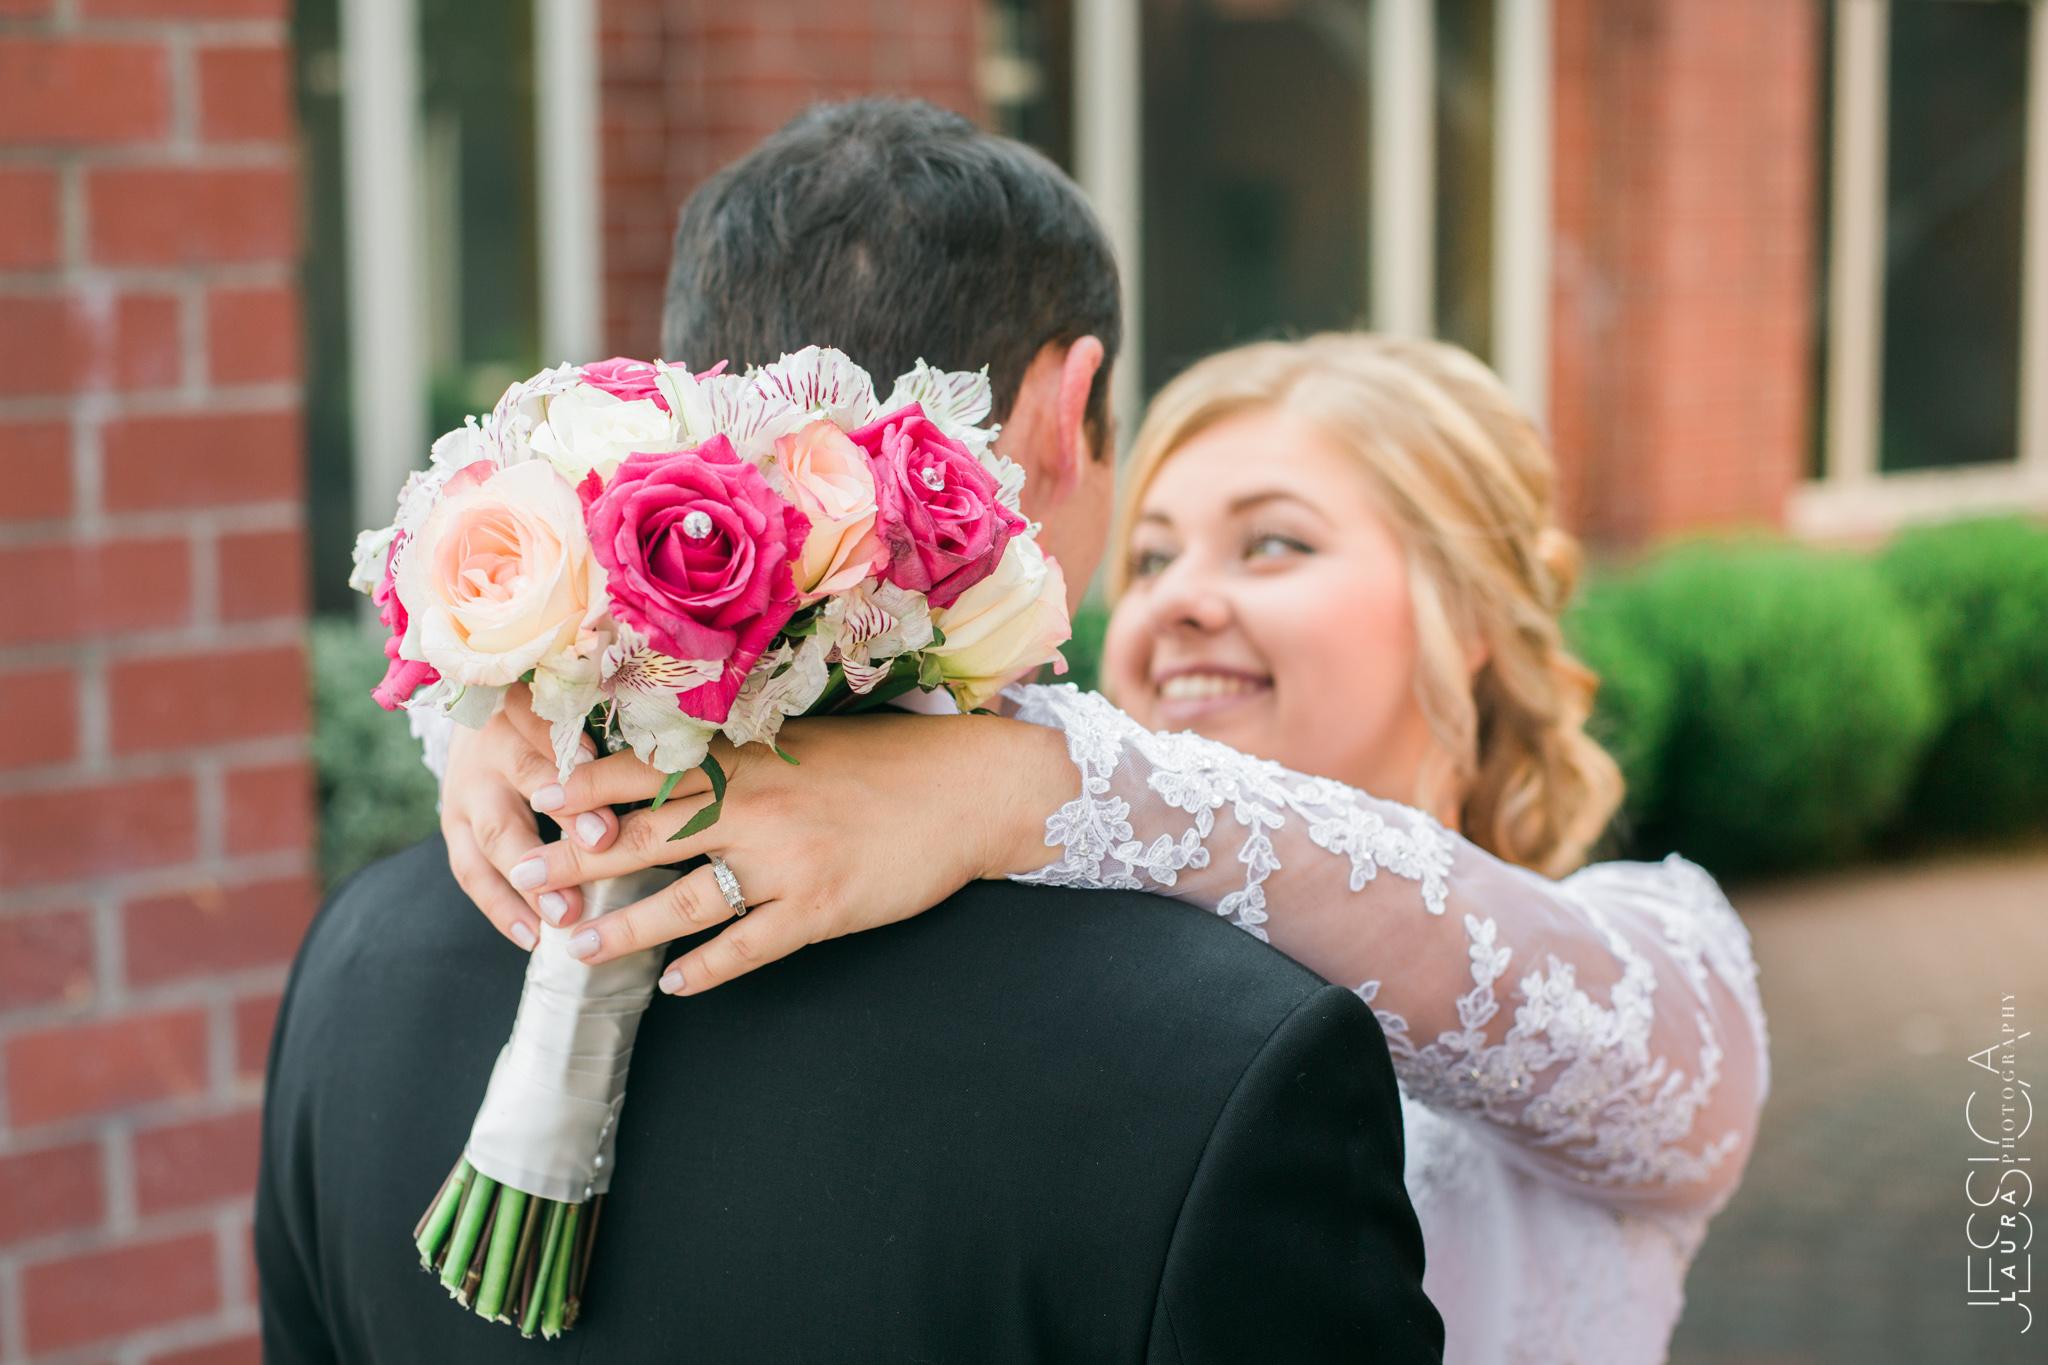 Eugene-Maryana_wedding_08062017_web (154 of 558).JPG